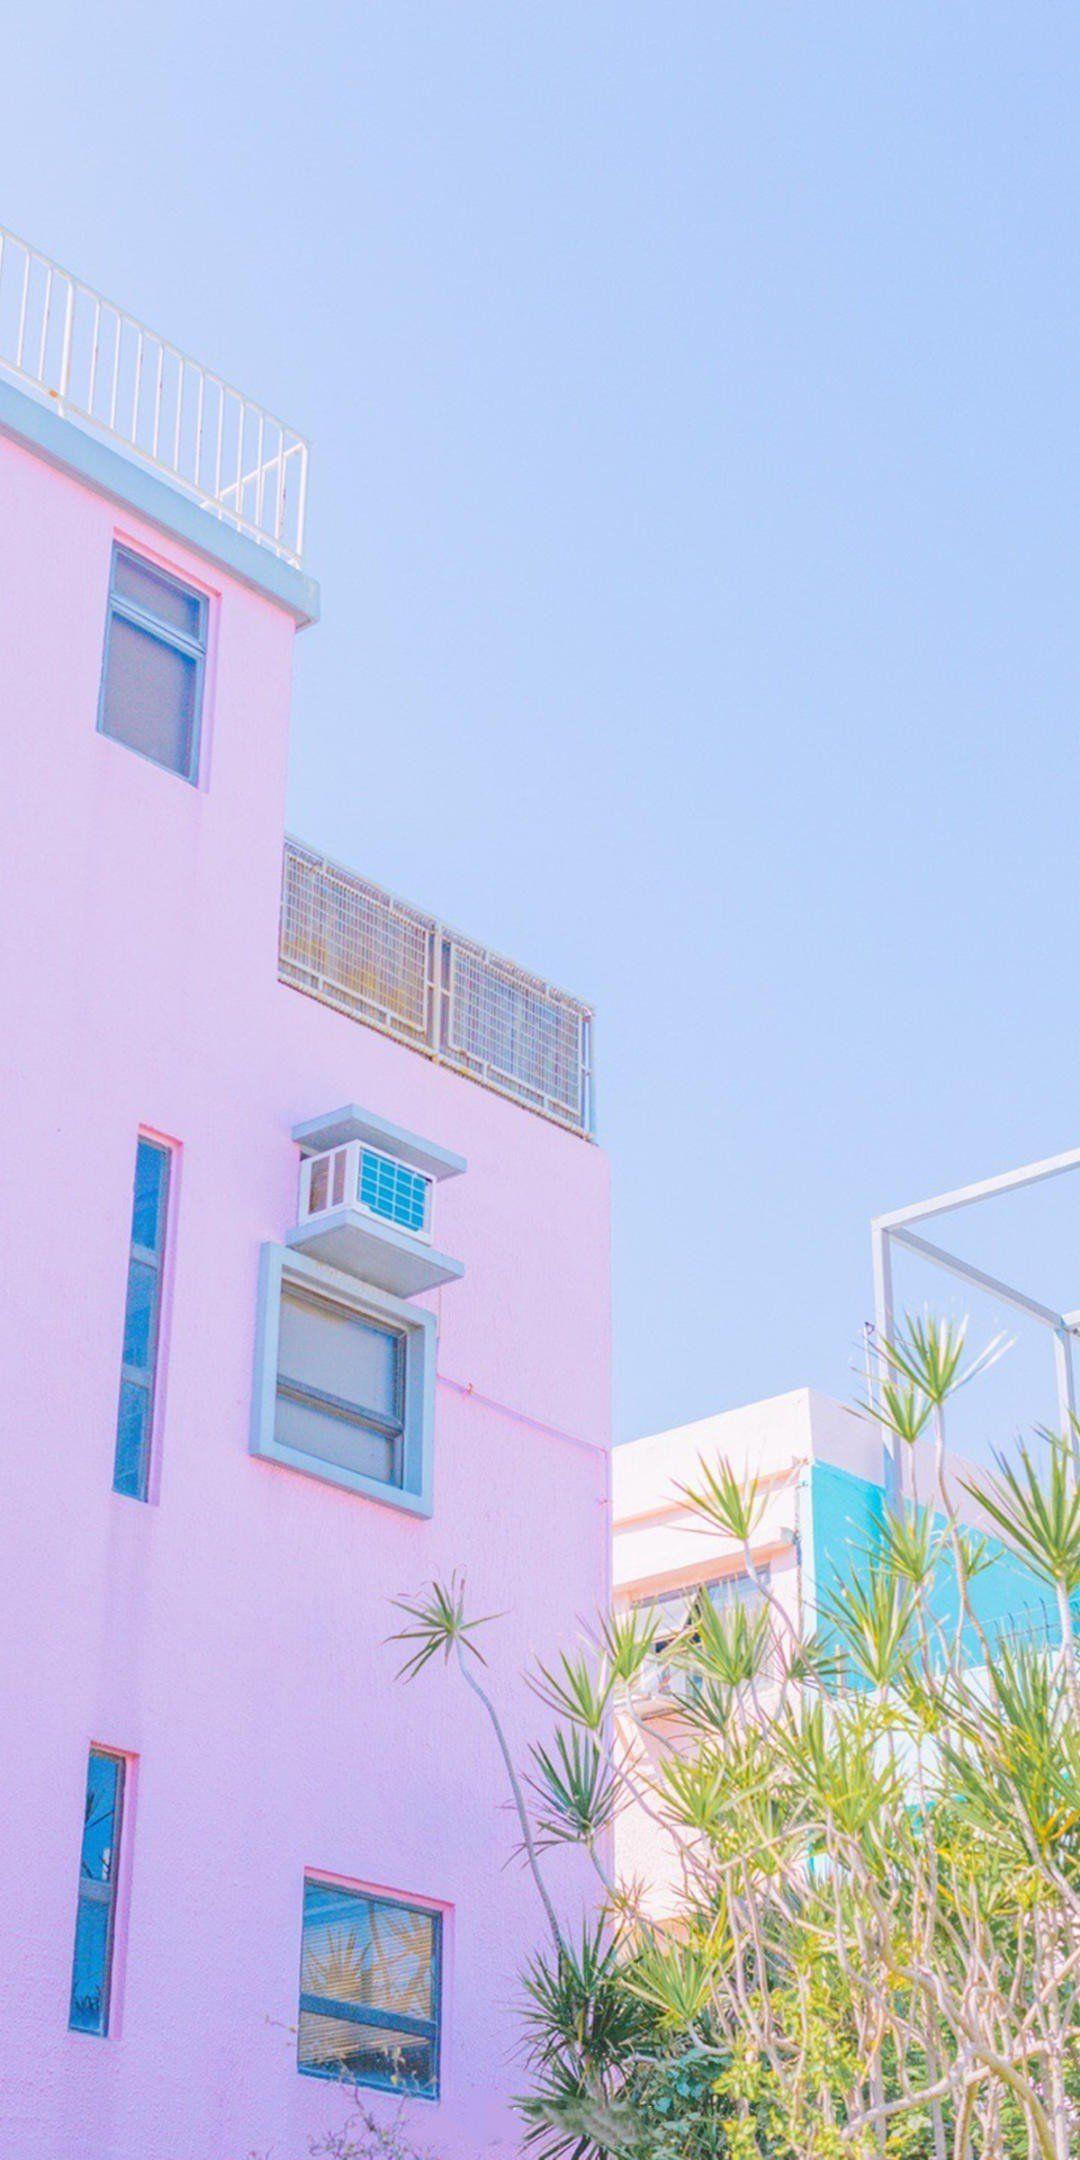 5e67b88db32ca - 粉色系少女心手机壁纸